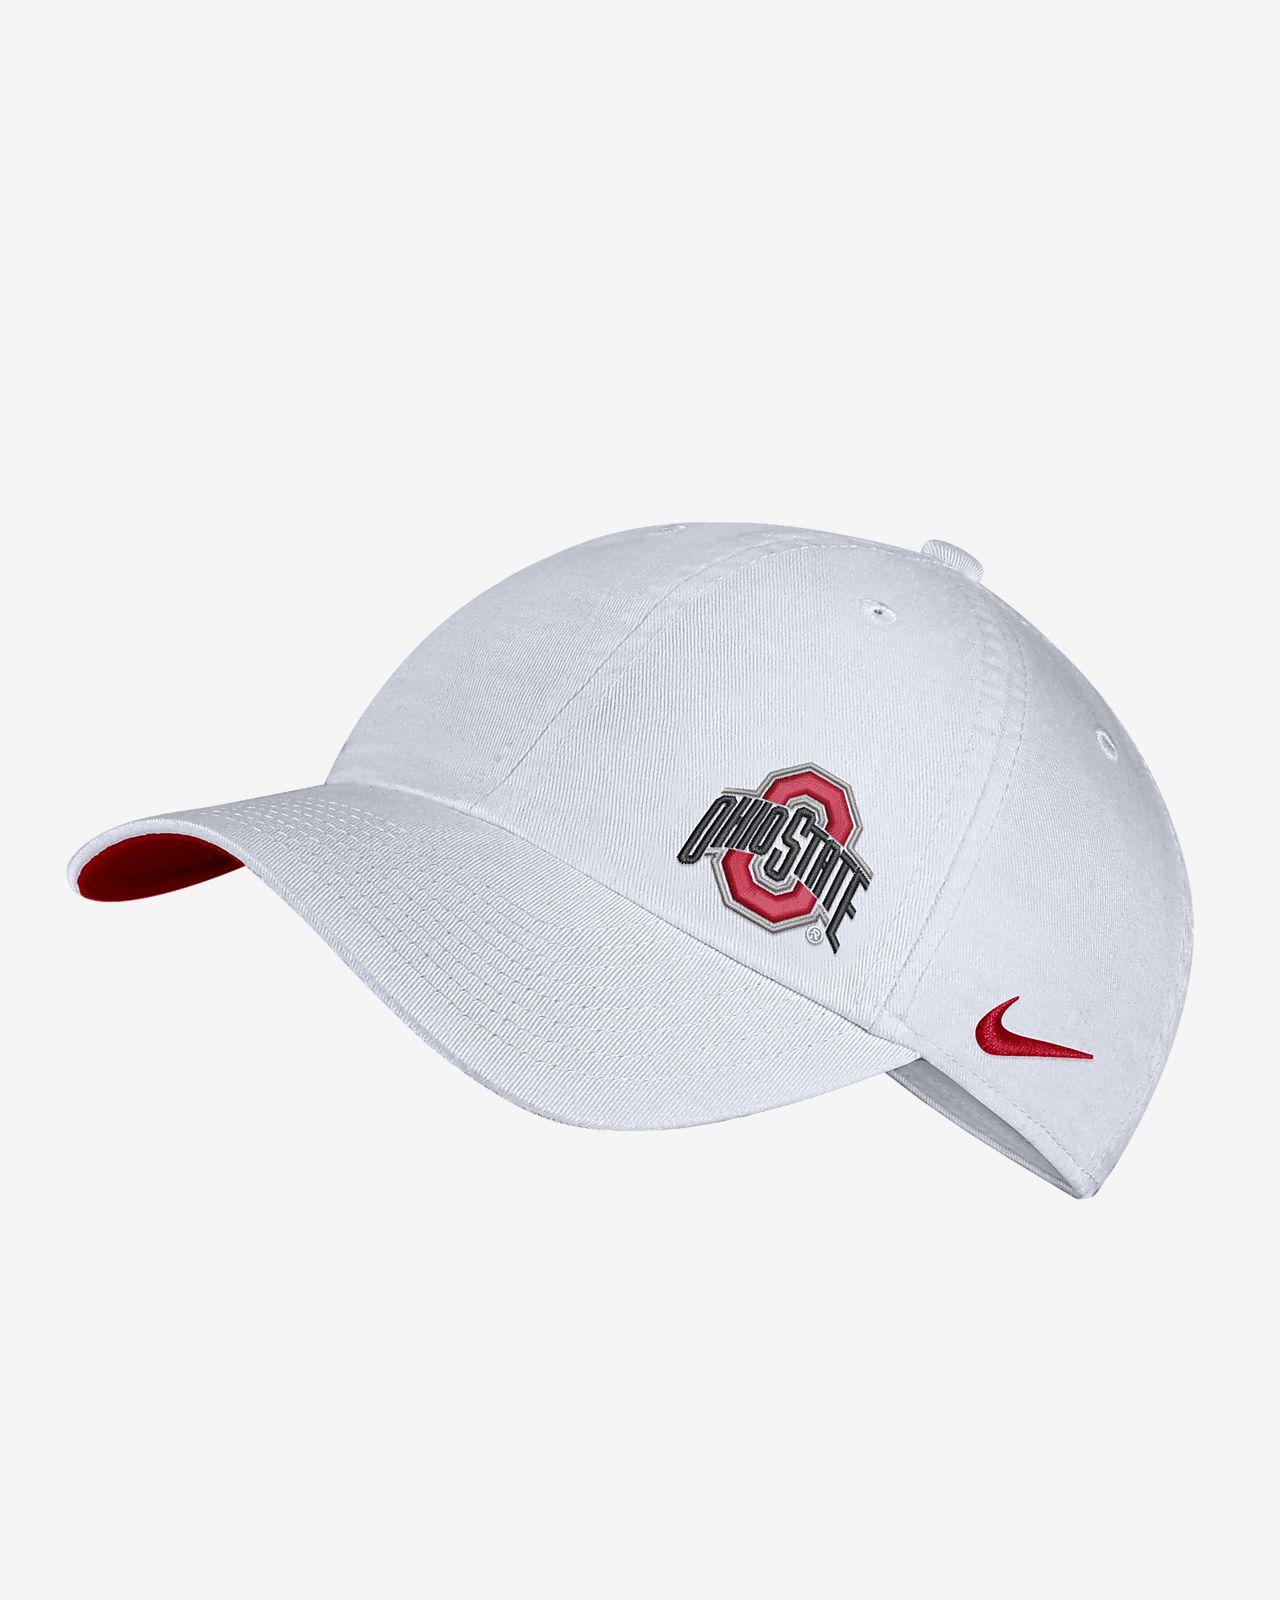 f4d17468d79 Nike College Heritage86 (Ohio State) Adjustable Hat. Nike.com